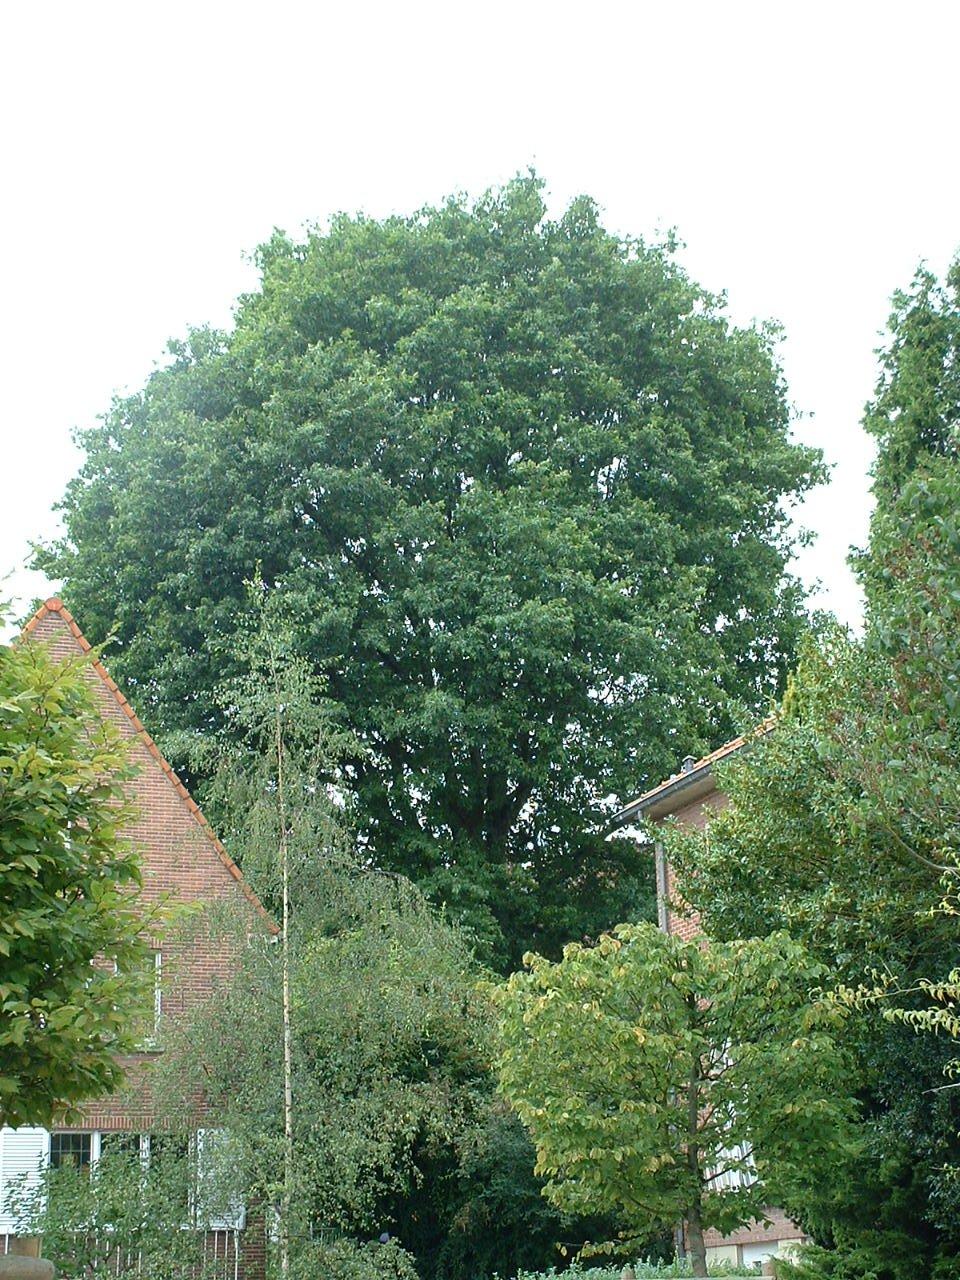 Amerikaanse eik – St.- Pieters - Woluwe, Europaplein, 13 –  23 August 2002